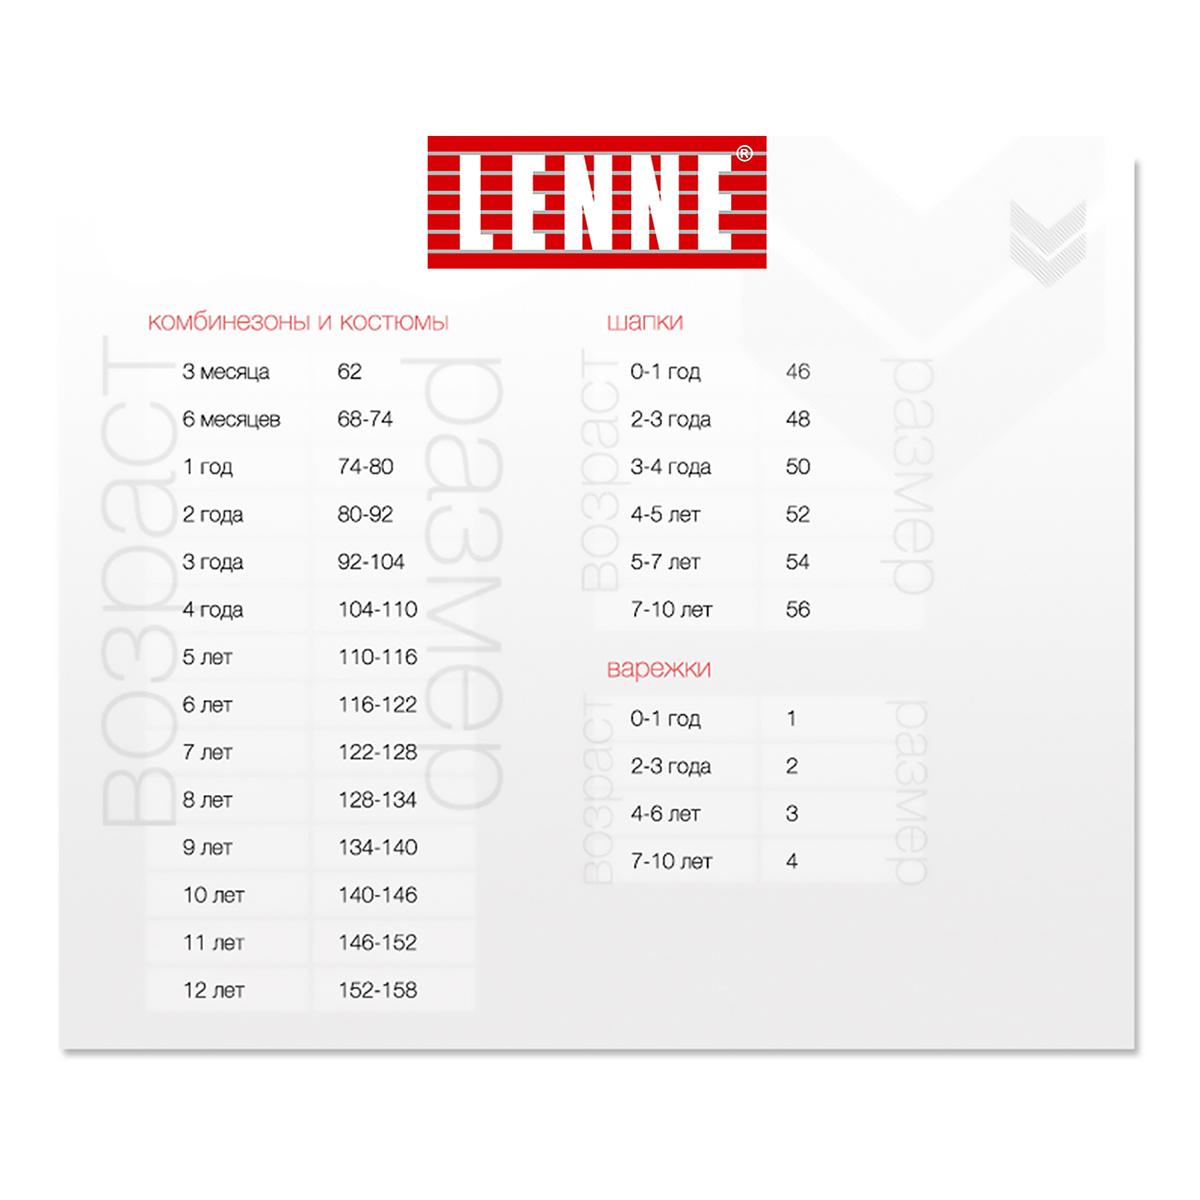 Купить Верхняя одежда, Парка LENNE Moss Red, р. 110 20339/622 ТМ: LENNE, красный